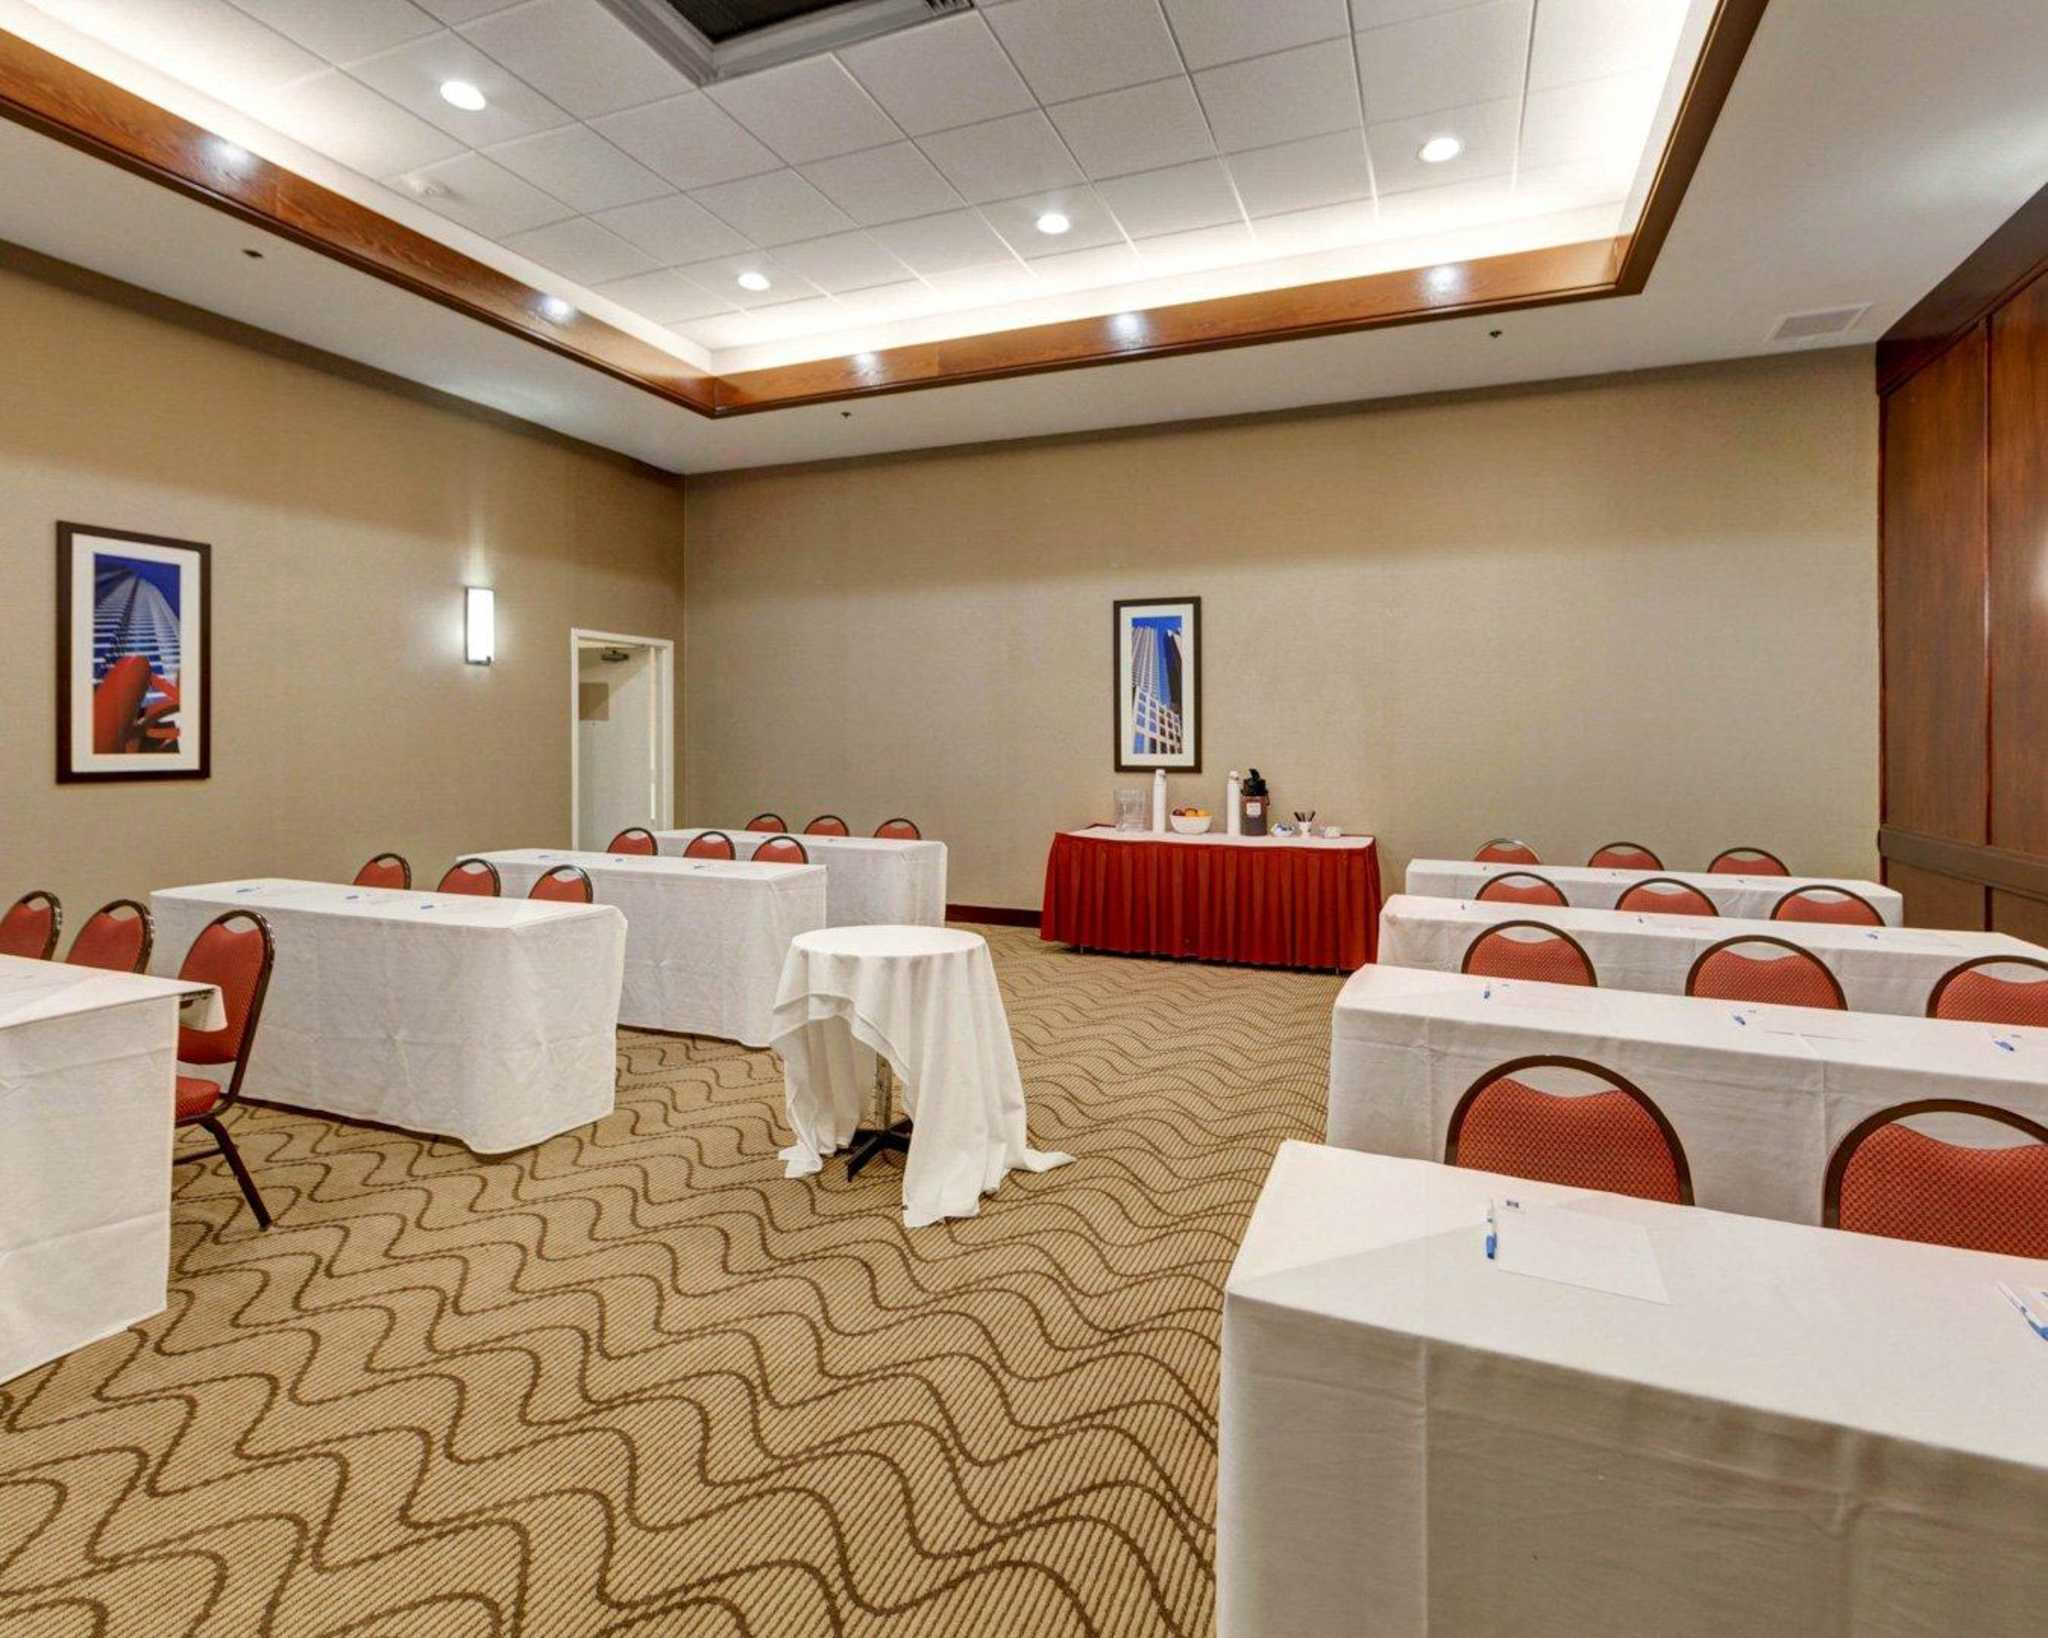 Comfort Inn & Suites Plano East image 31